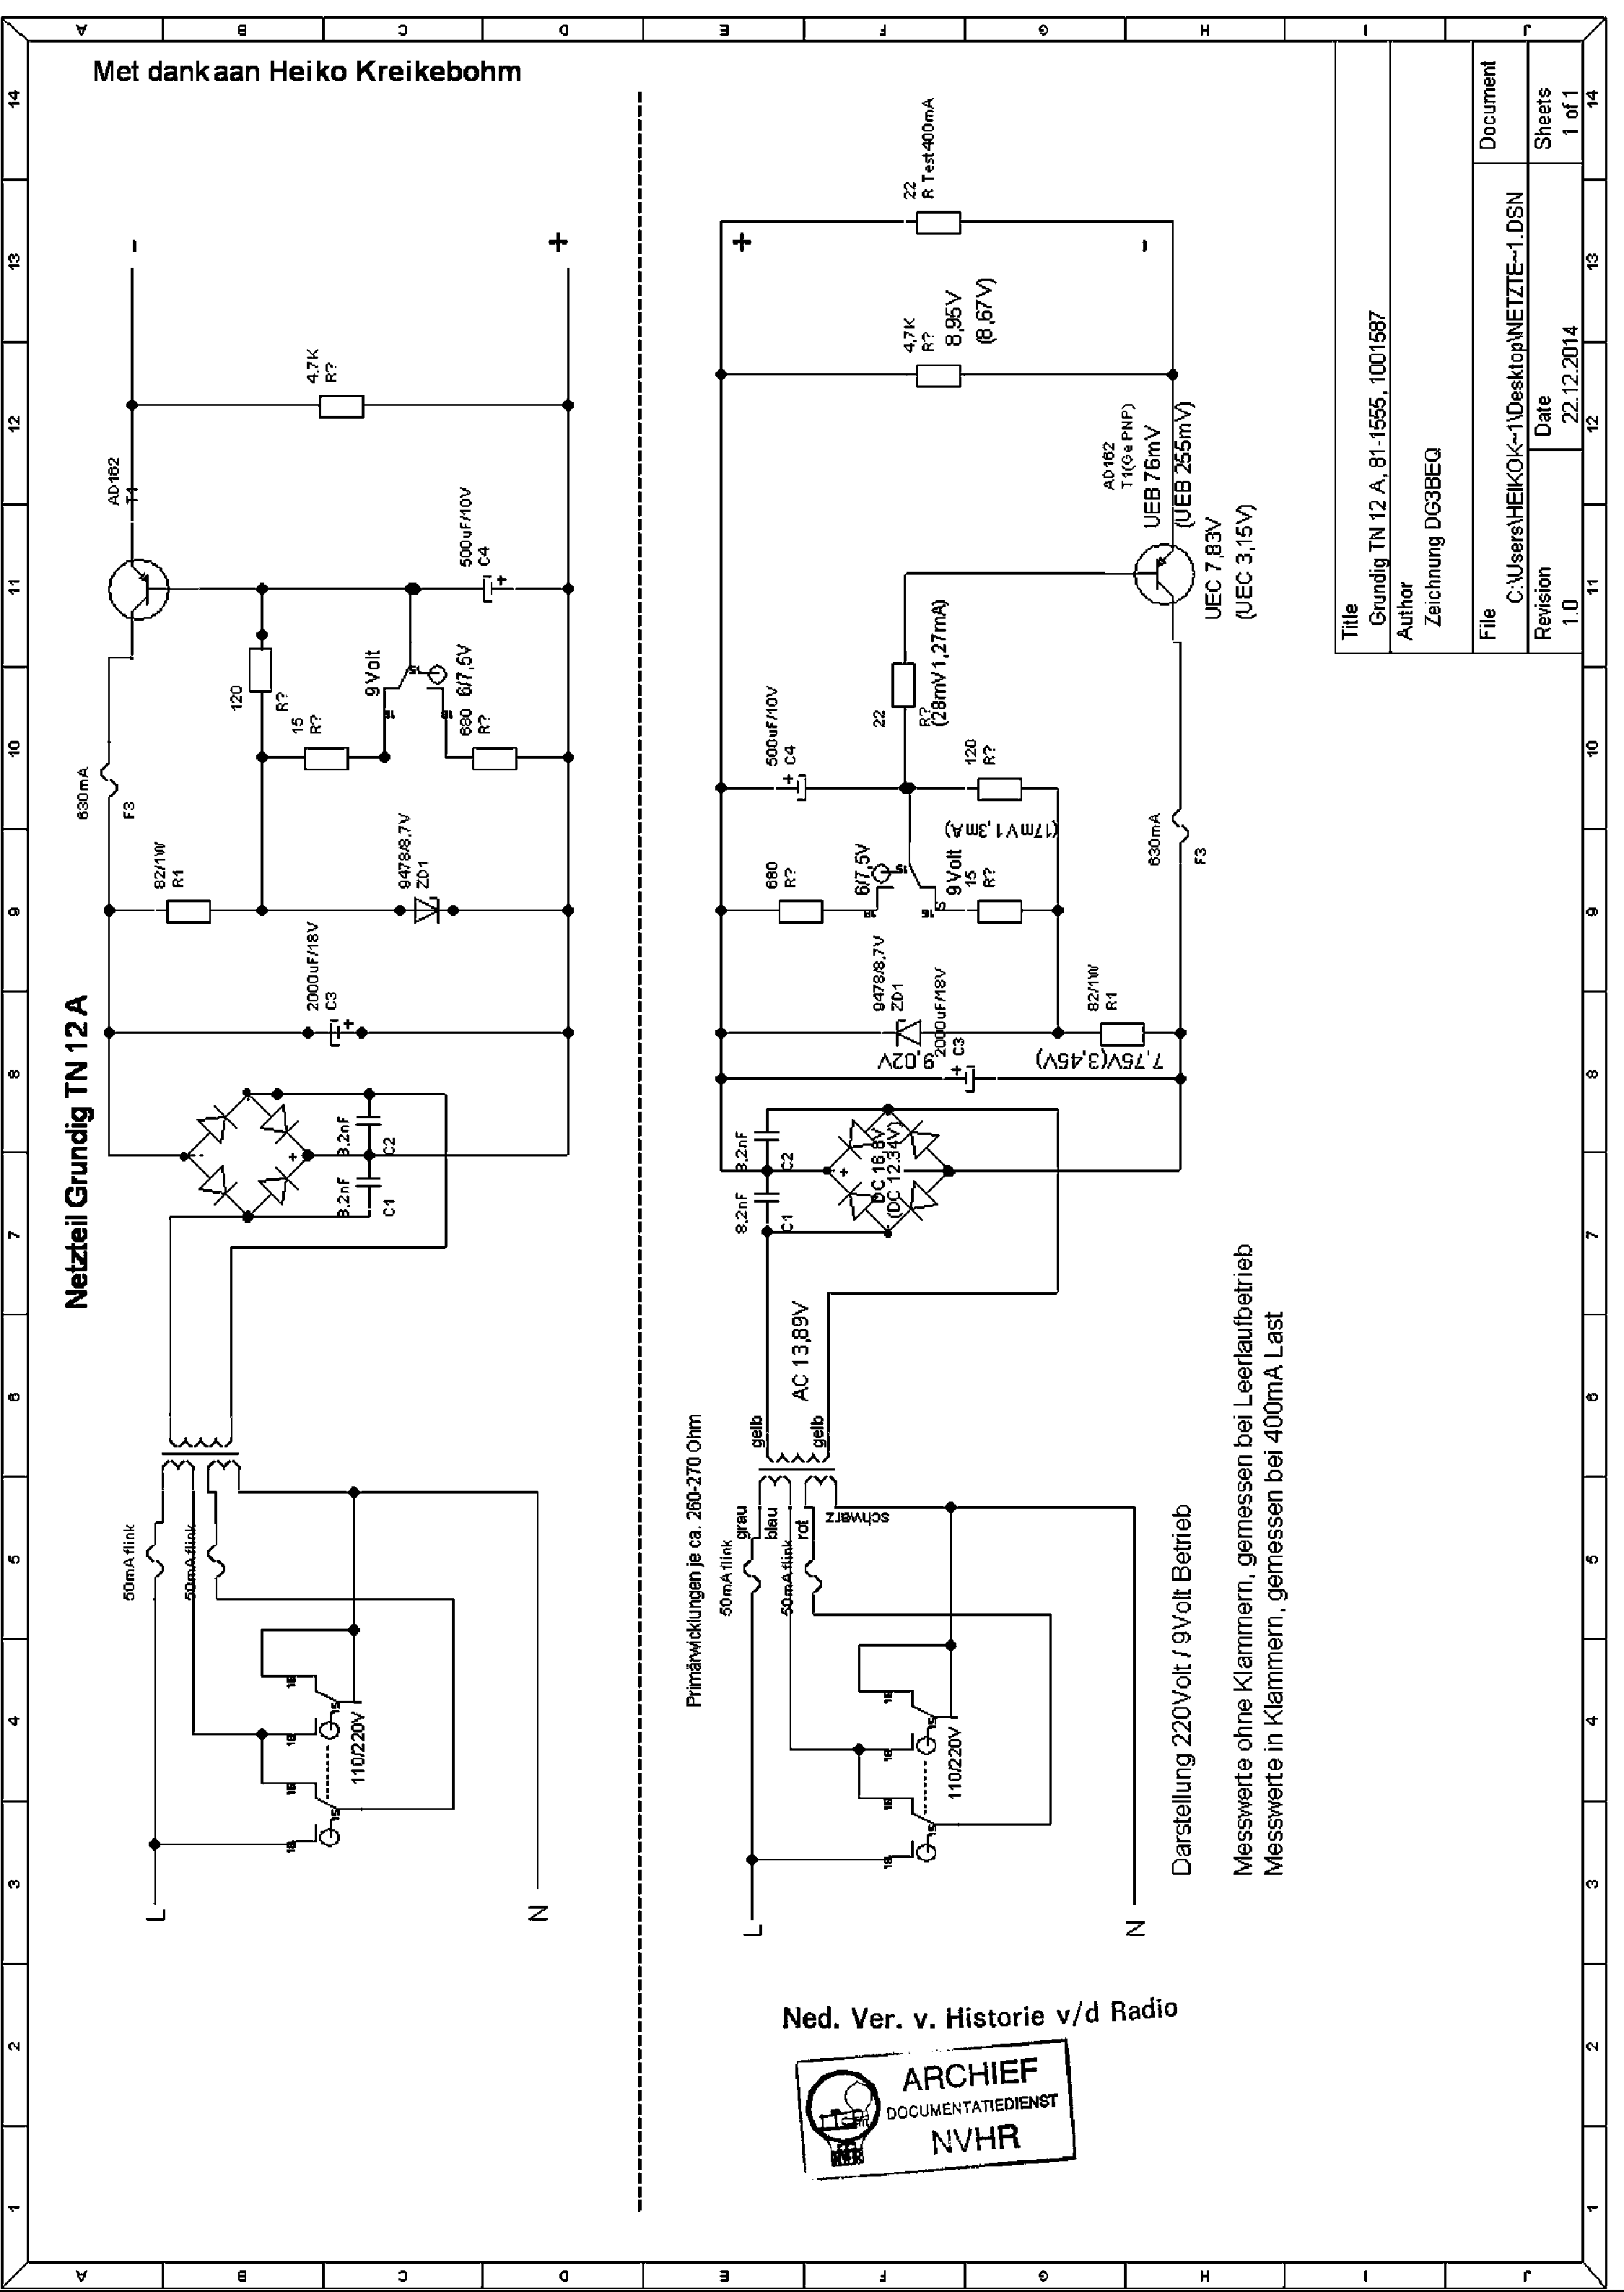 Grundig Tn12a 81 1555 1001587 9v 0 4a Vers Power Supply